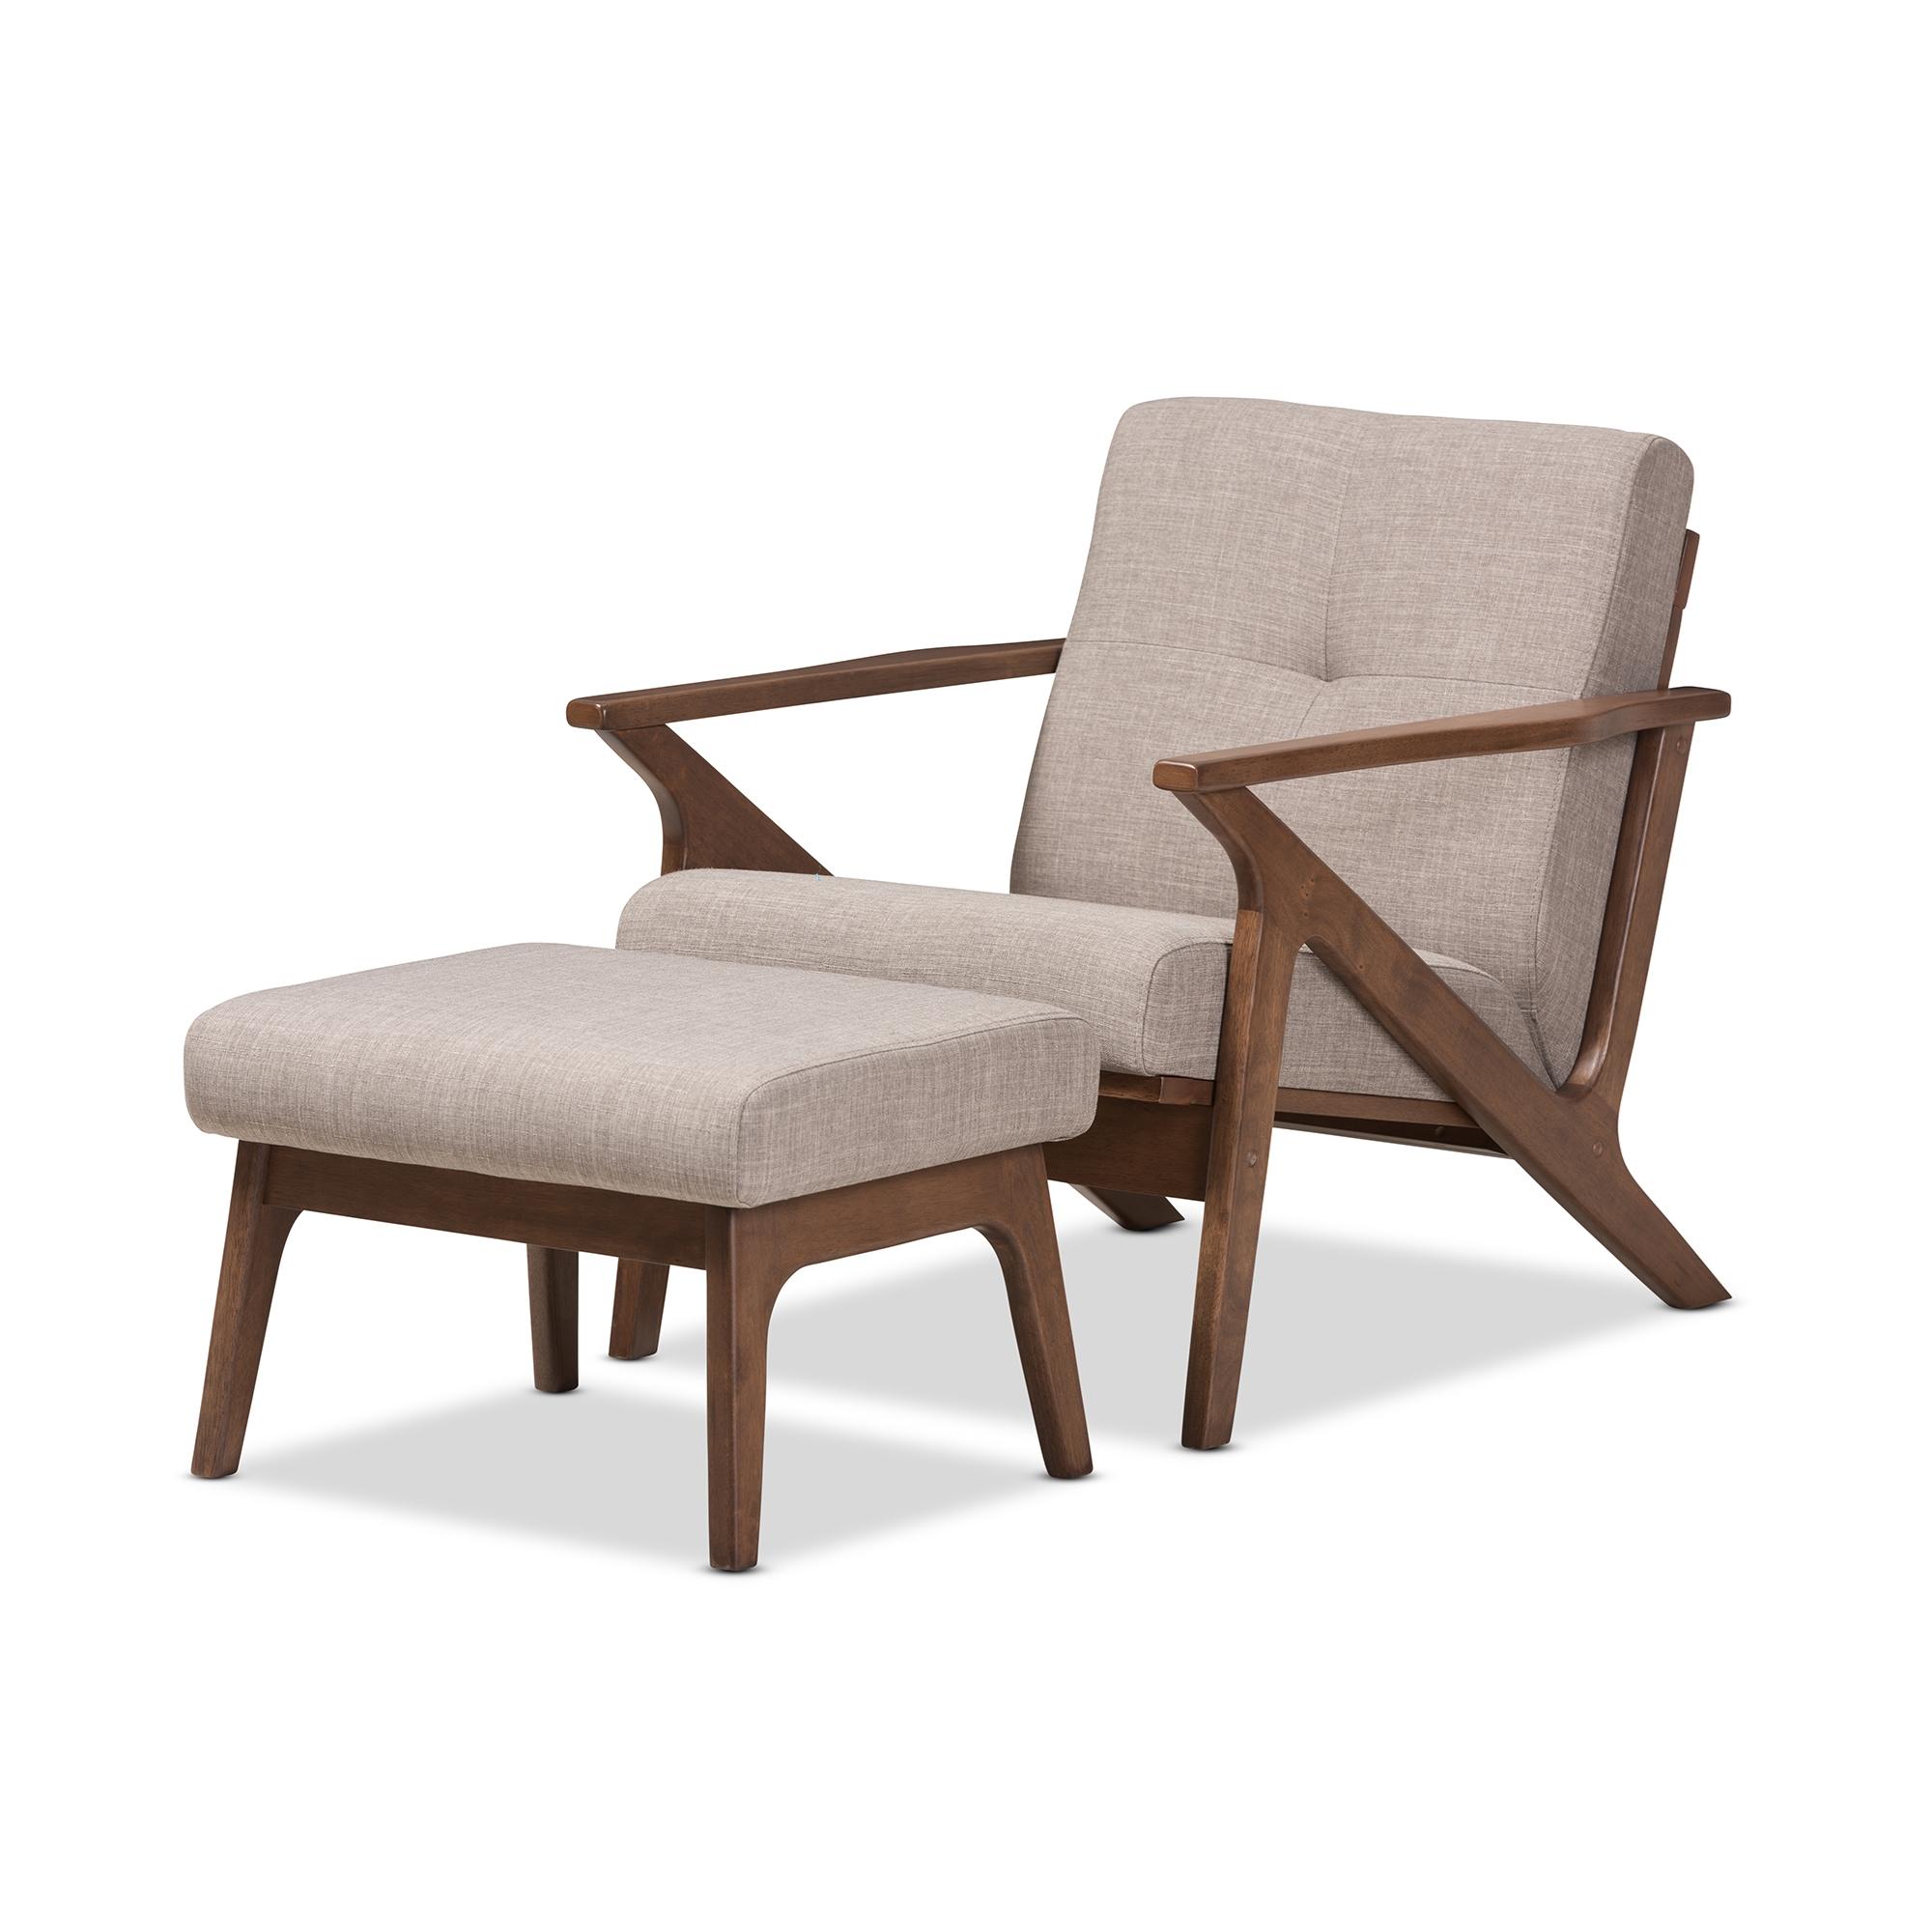 Baxton Studio Bianca Mid Century Modern Walnut Wood Light Grey Fabric  Tufted Lounge Chair And Ottoman Set